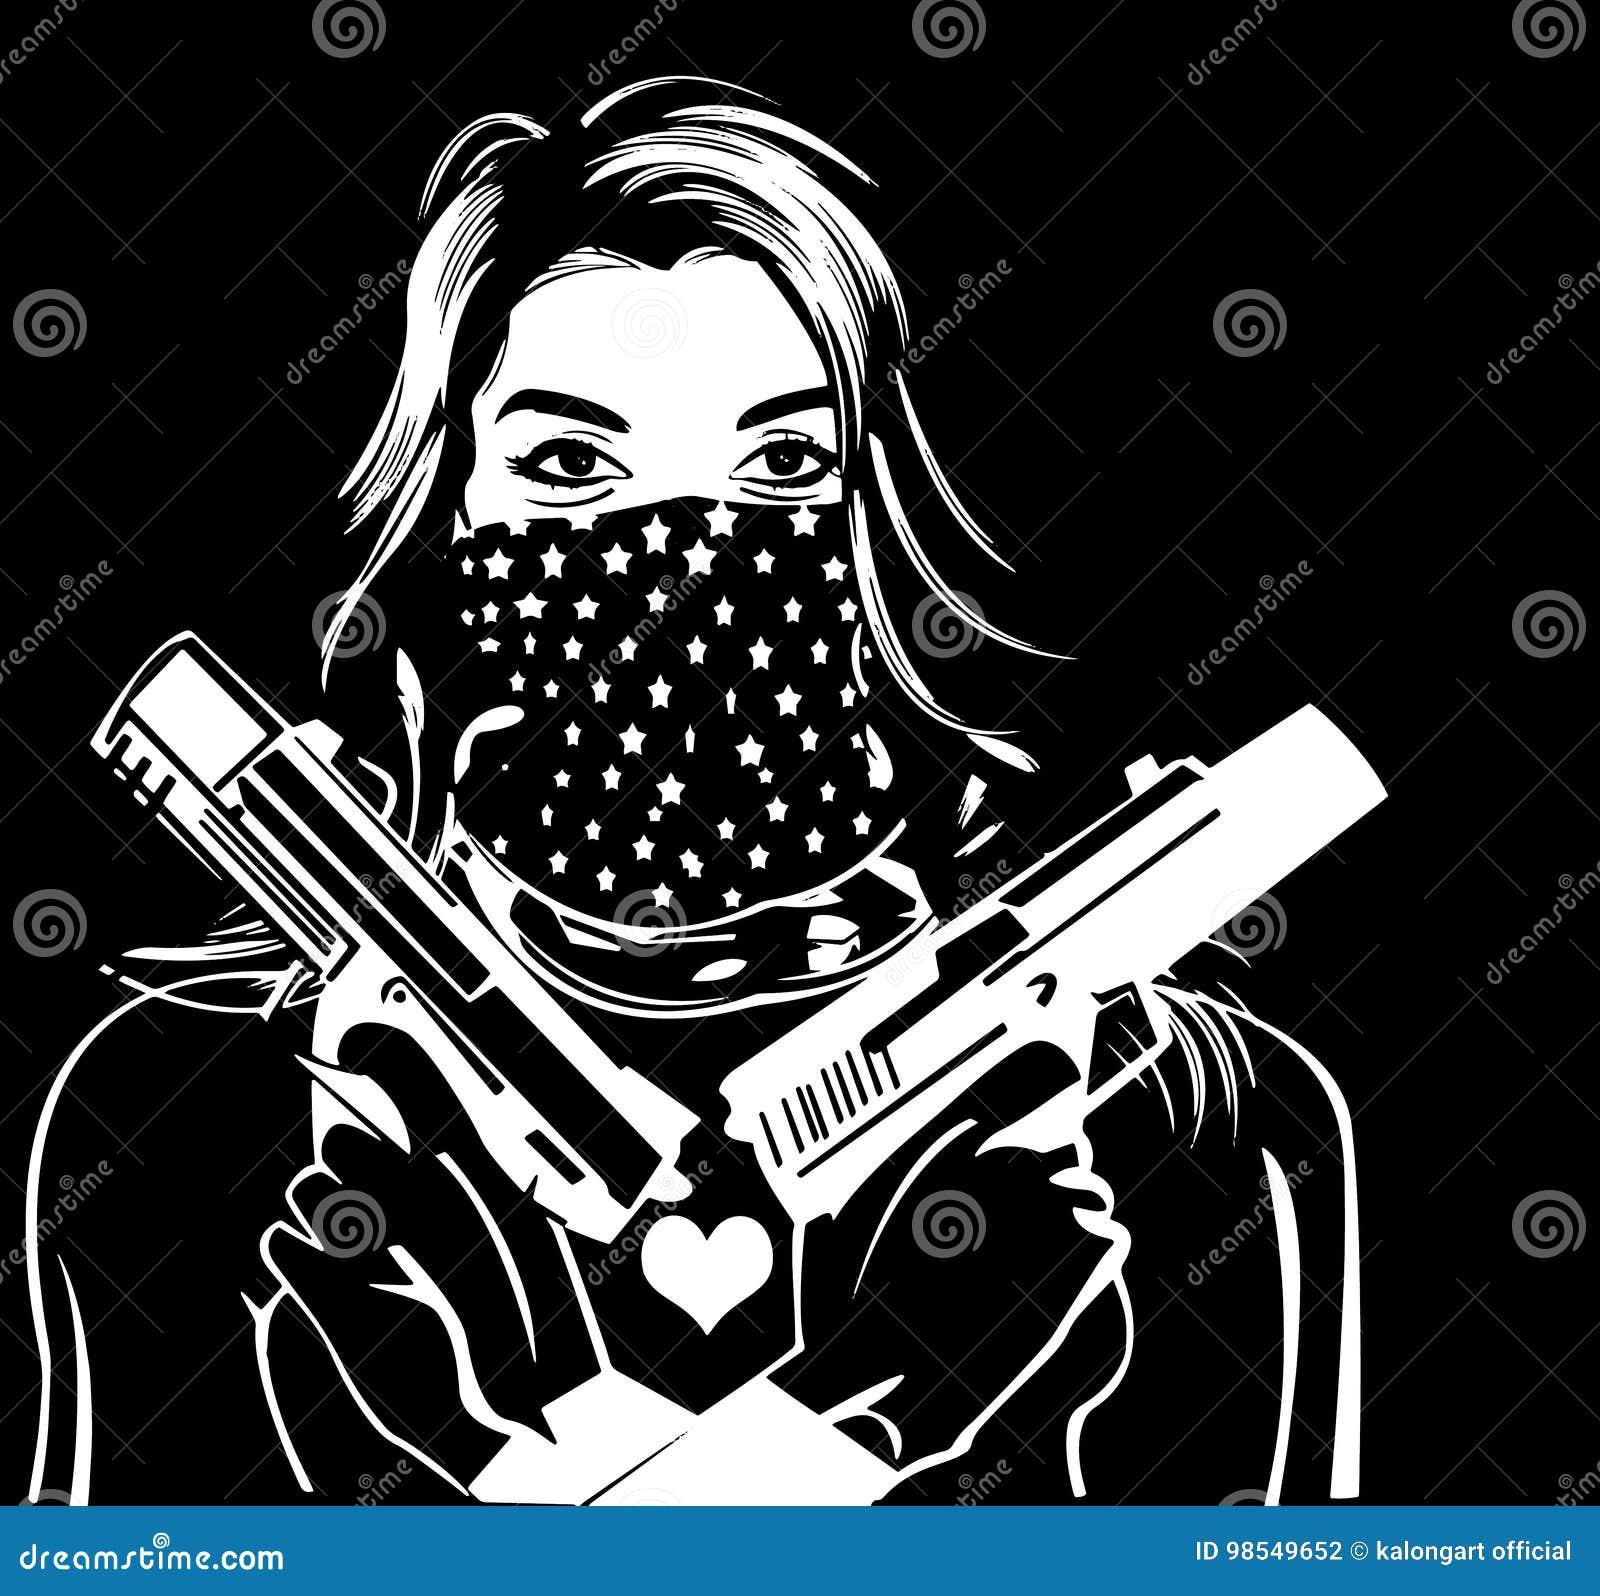 It's just a picture of Versatile Gun Stencils Printable